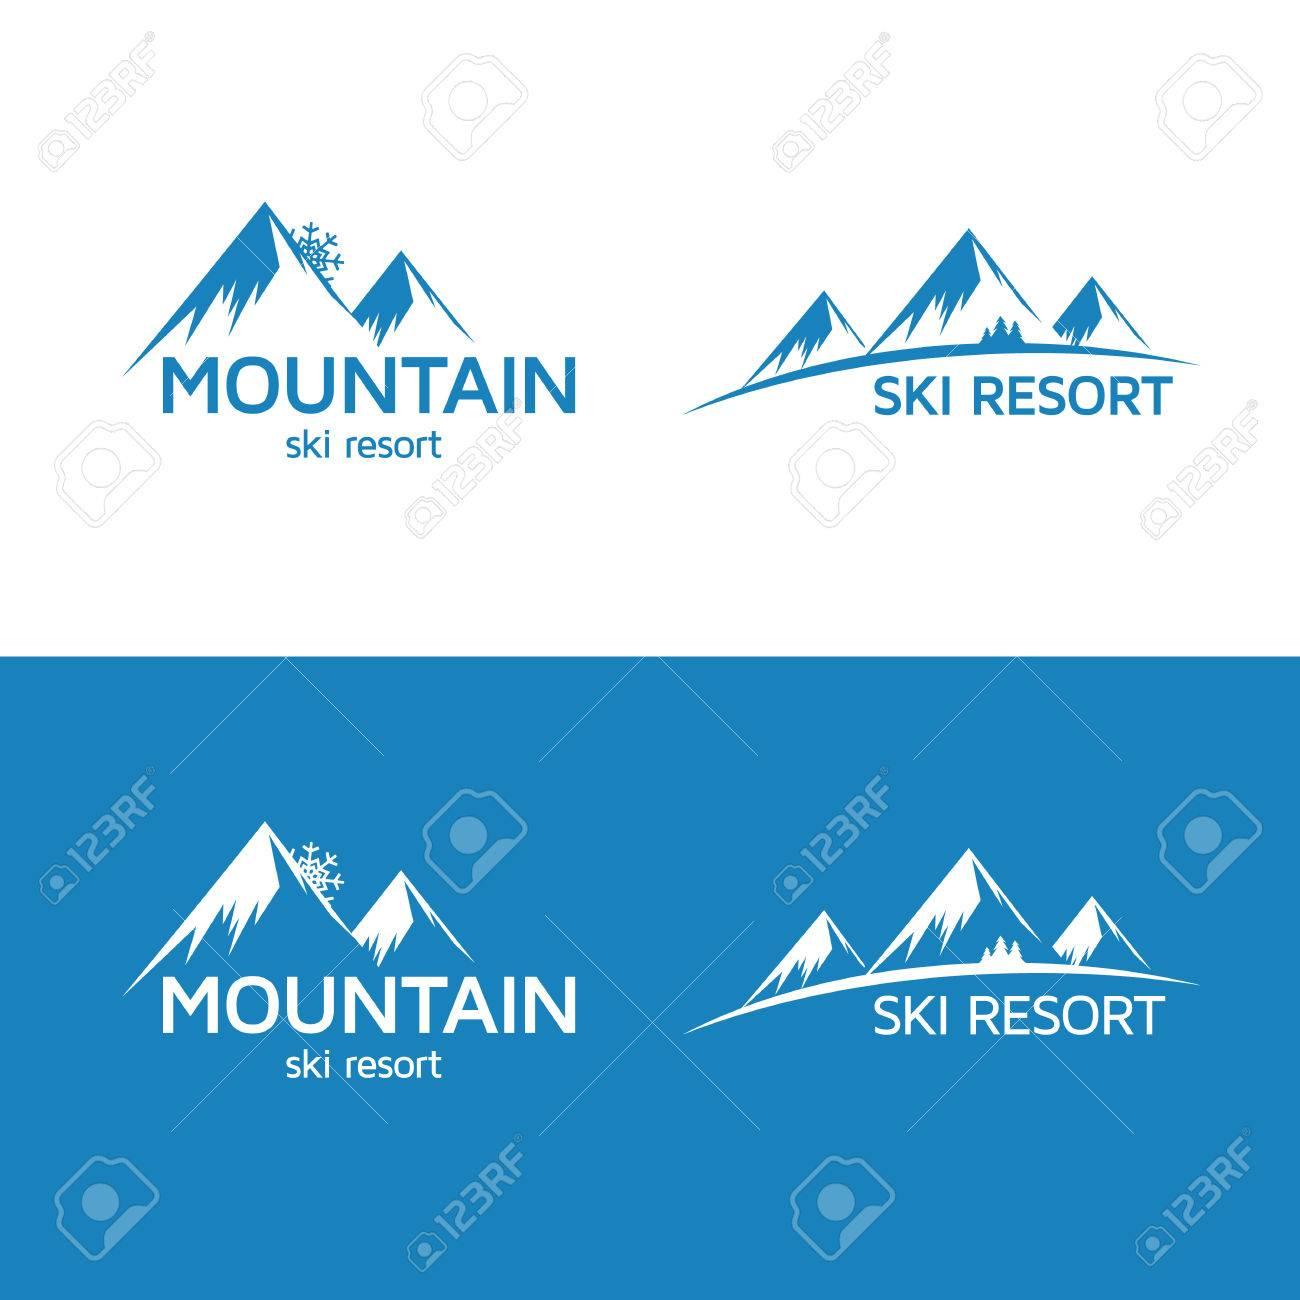 Ski resort logo template. Mountain silhouette. - 54017709